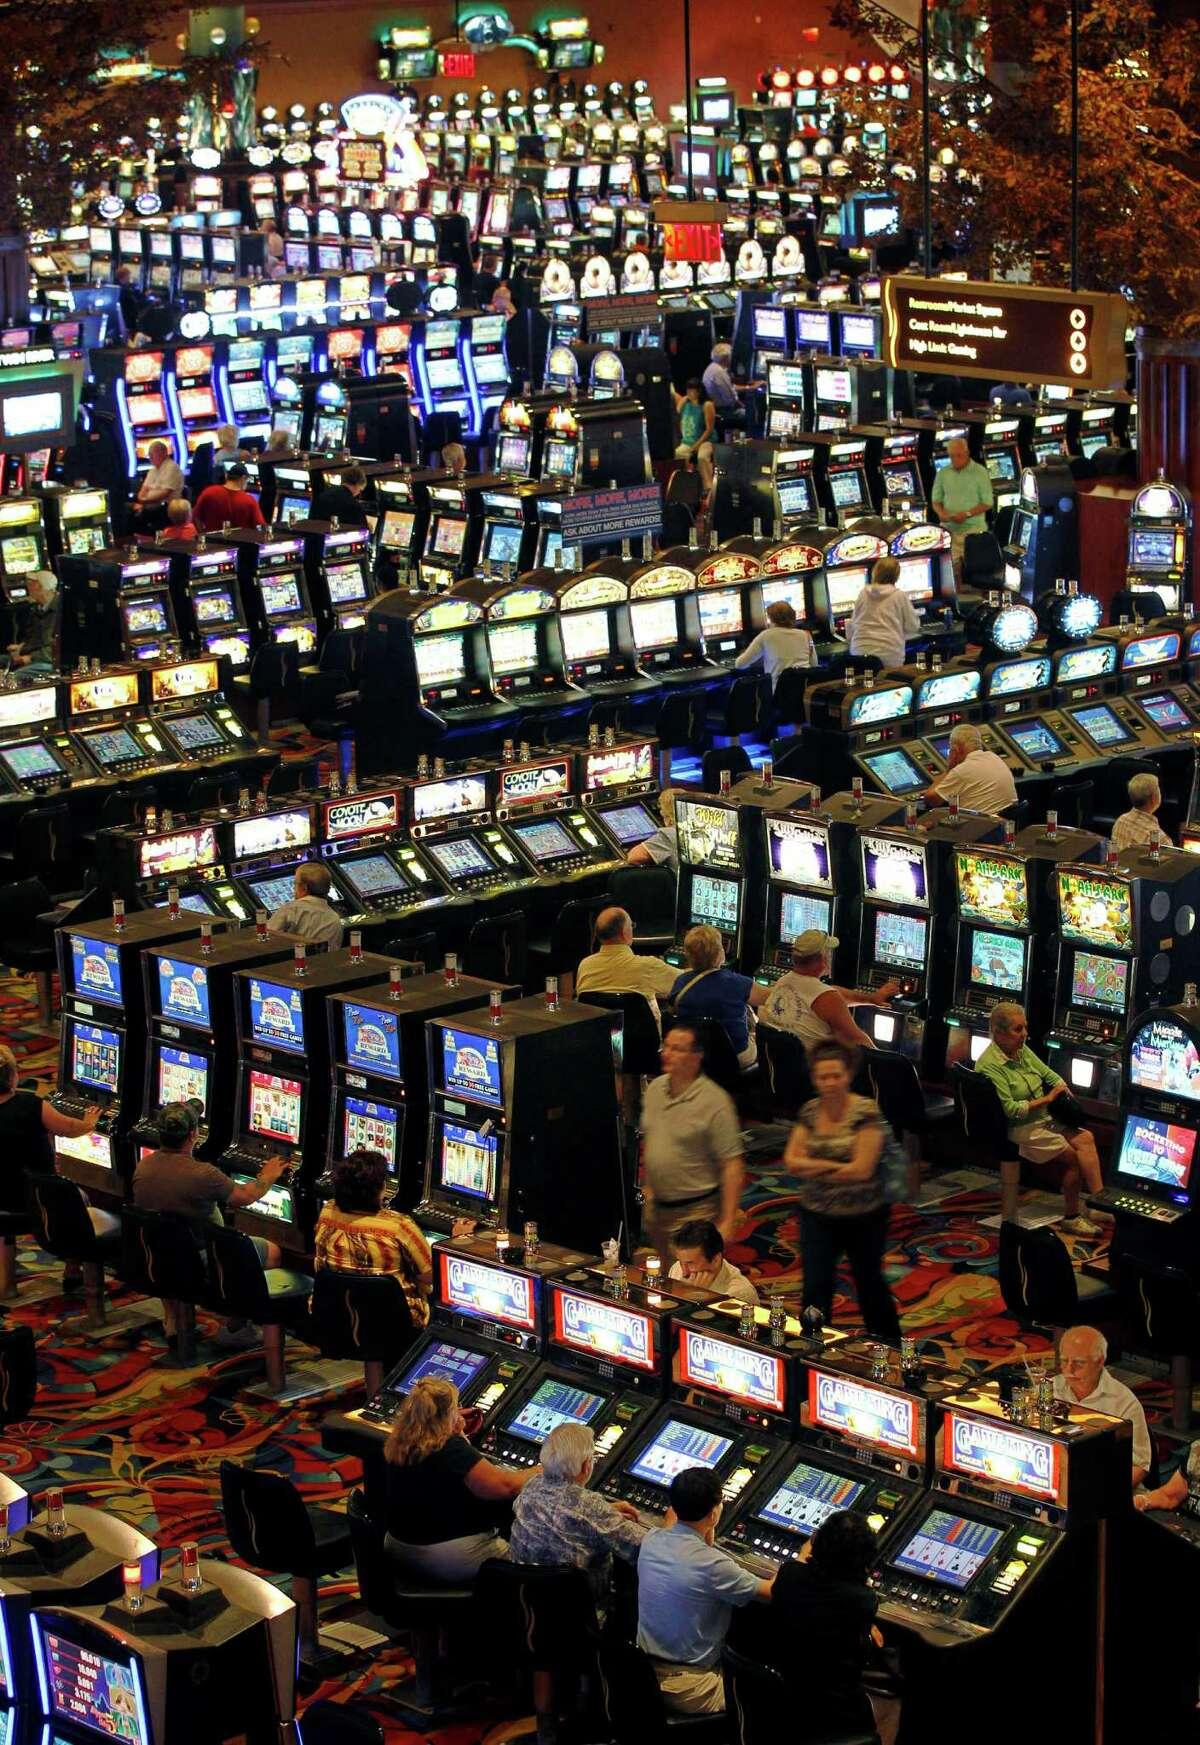 States where fantasy sports betting is considered illegal or gambling: New York, Illinois, Iowa, Mississippi, Louisiana, Texas, Arizona, Nevada, Montana, Washington, Hawaii